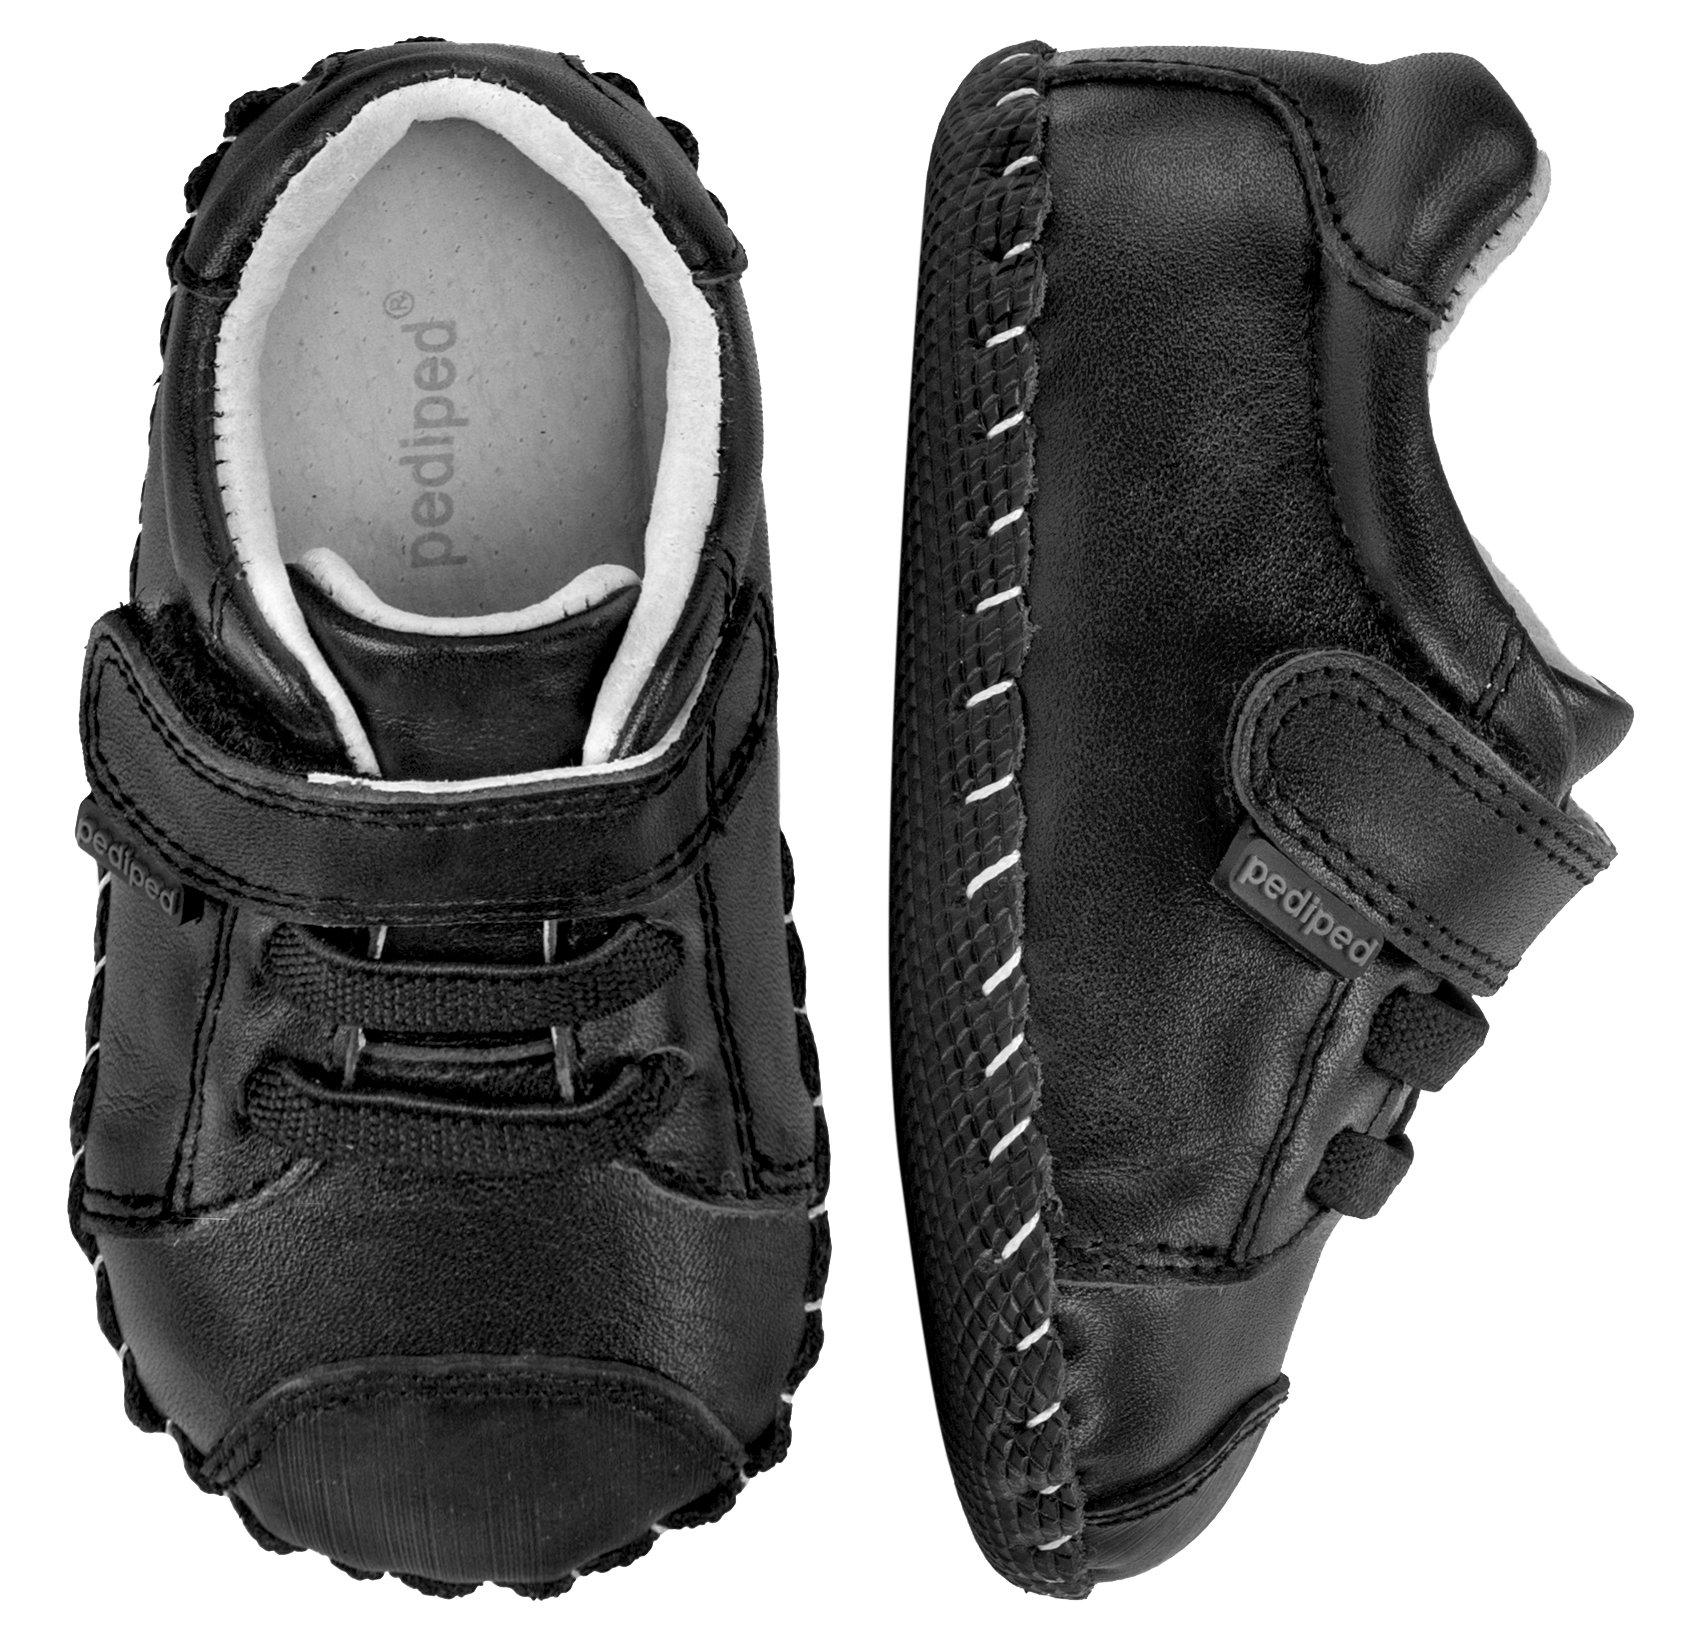 pediped Boys' Jake Crib Shoe, Black, 0-6 Months Child EU Infant (0-6 Months US) by pediped